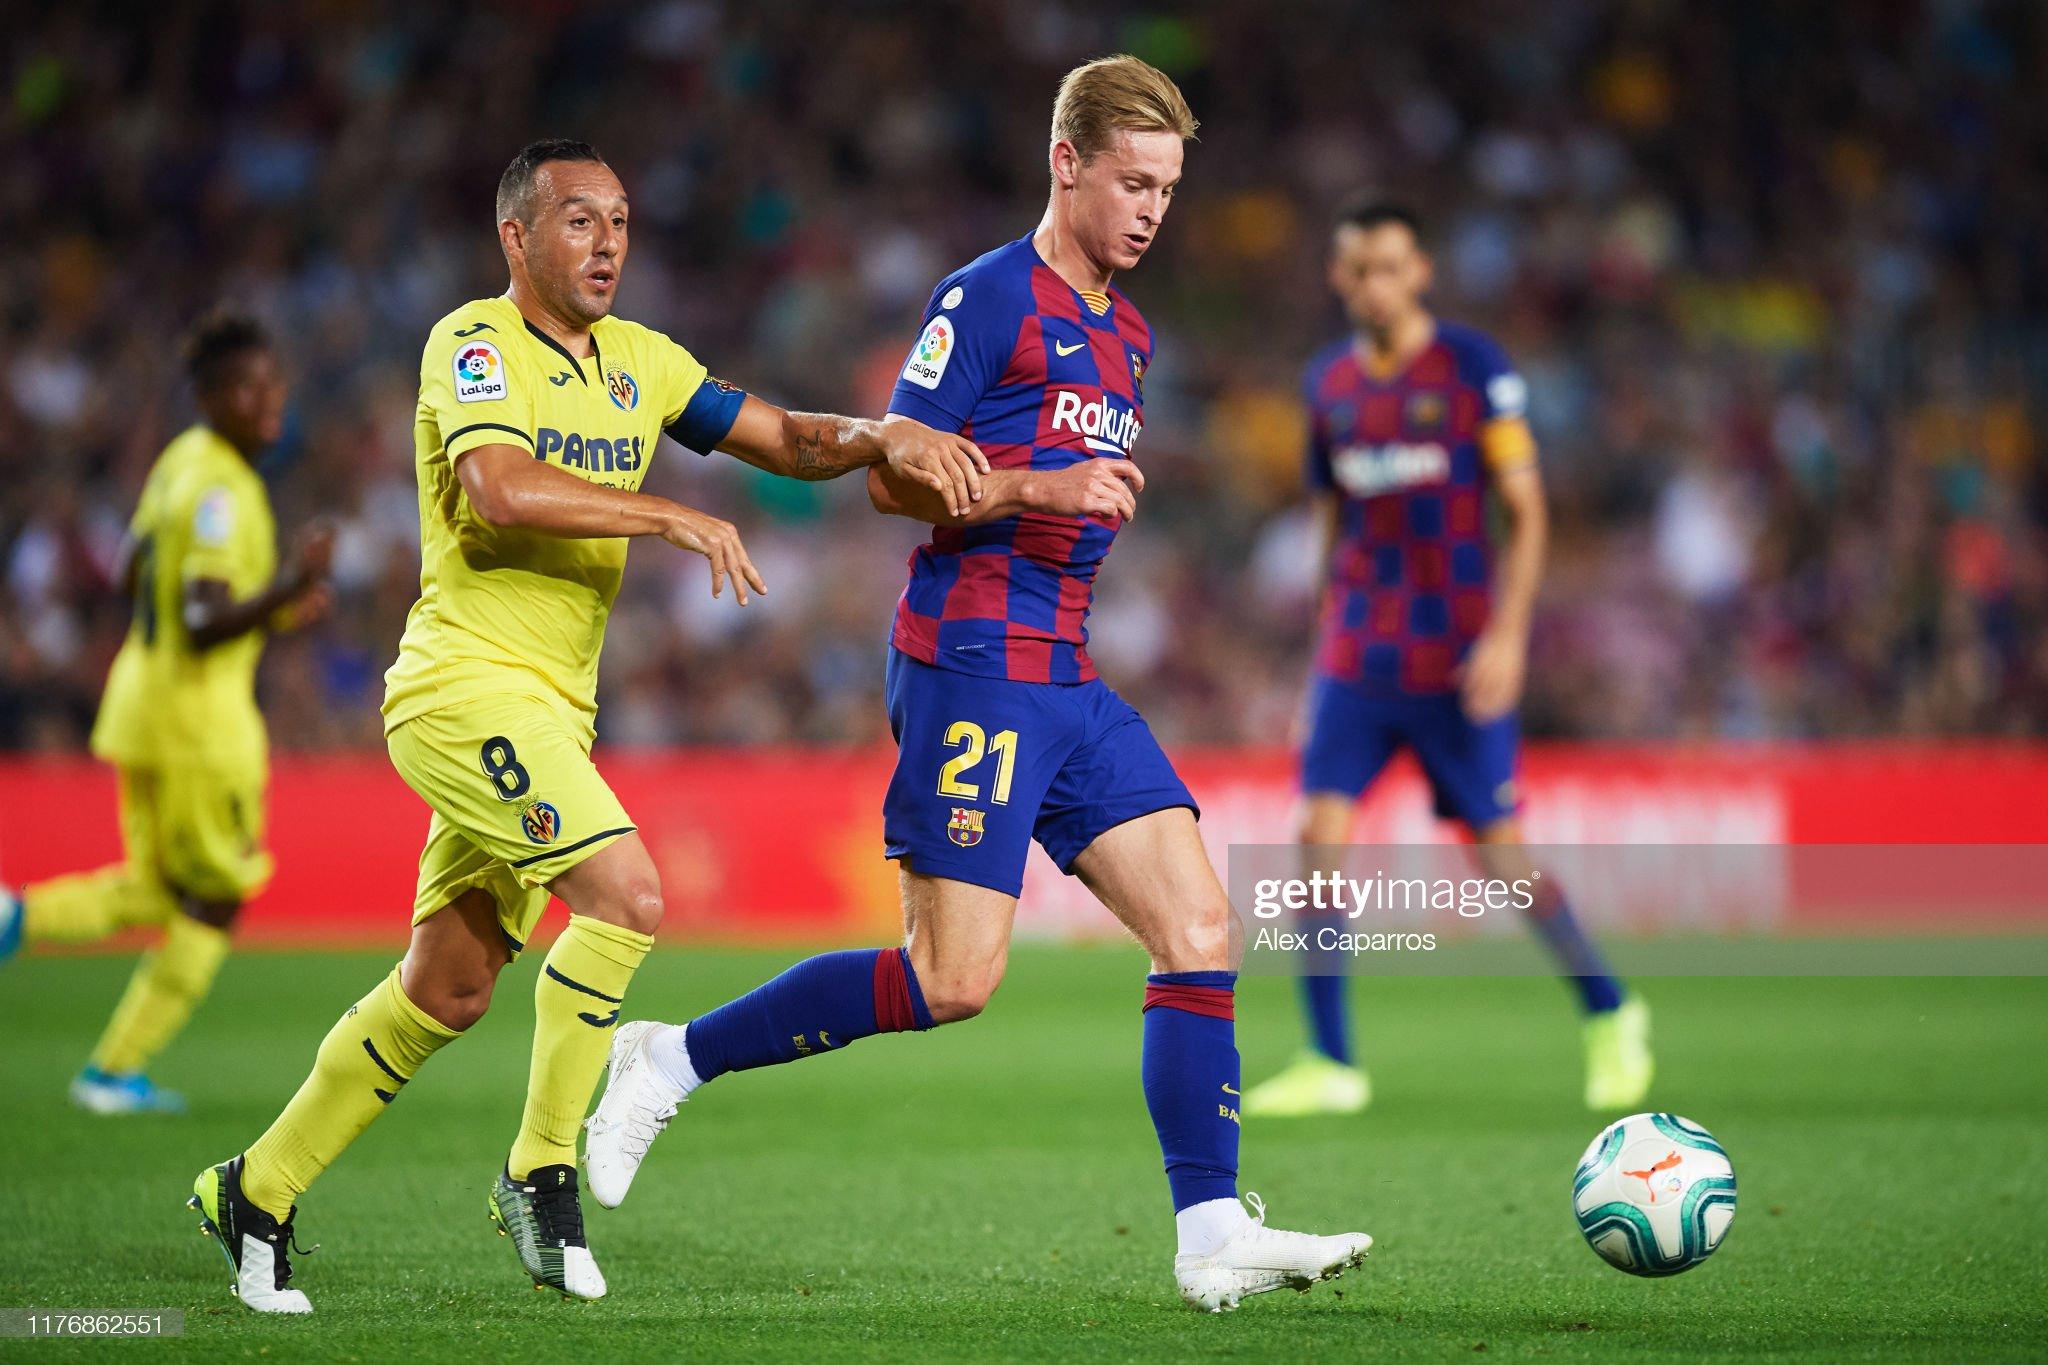 صور مباراة : برشلونة - فياريال 2-1 ( 24-09-2019 )  Frenkie-de-jong-of-fc-barcelona-conducts-the-ball-under-pressure-from-picture-id1176862551?s=2048x2048